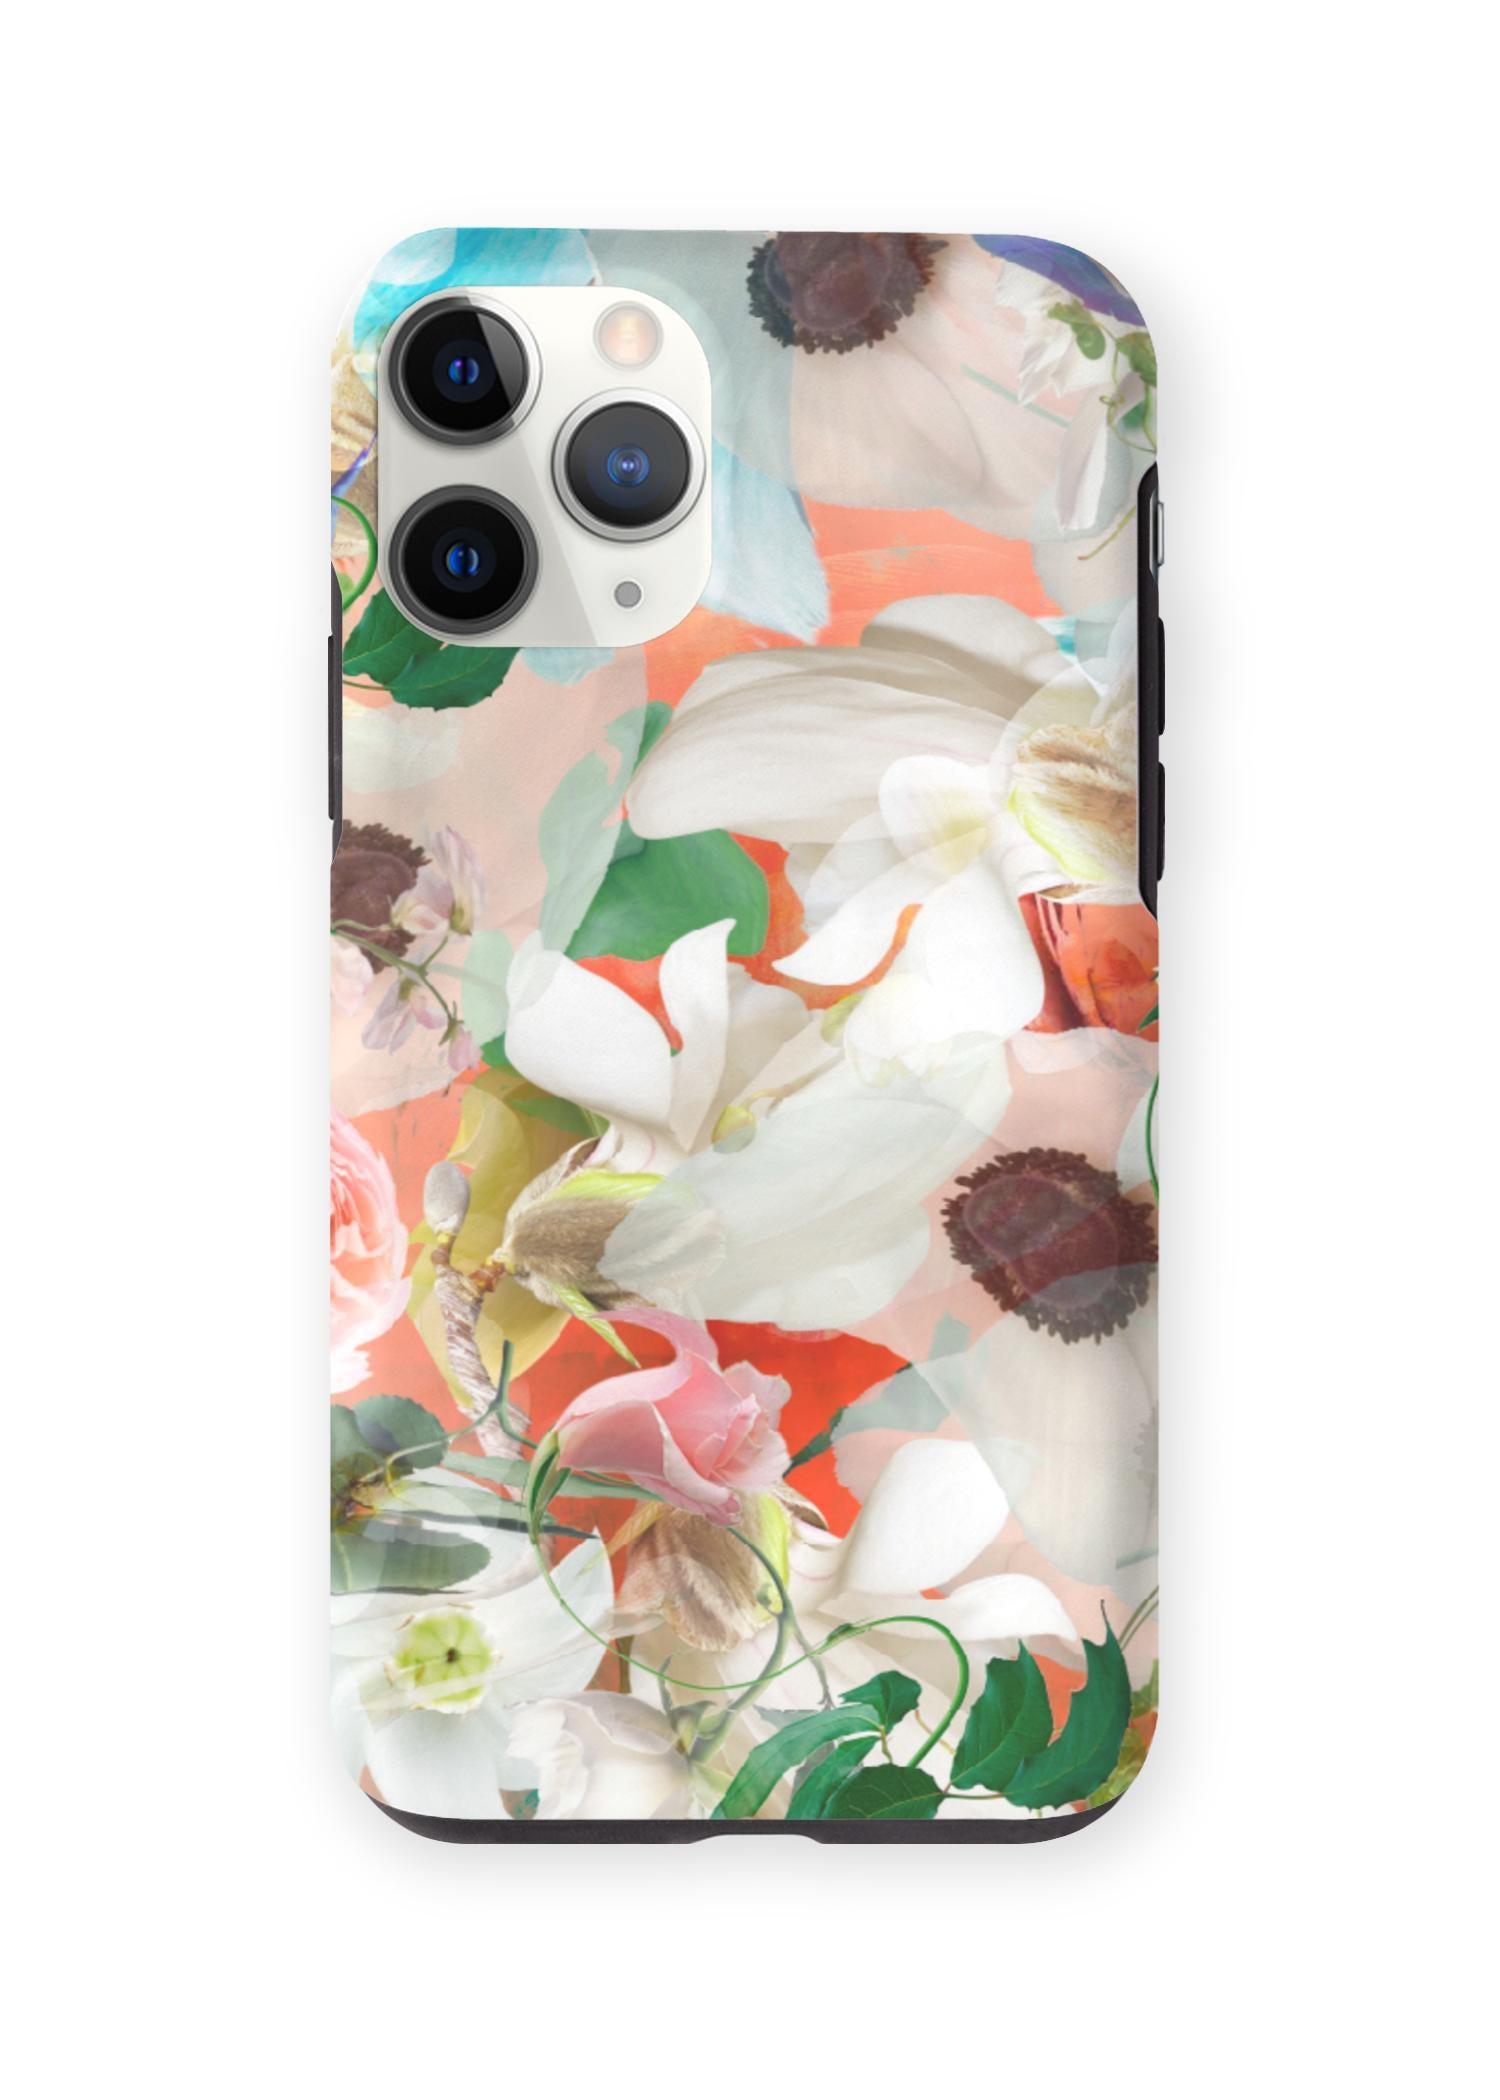 PRIDE iPhone Case - Colour Garden #3 by PRIDE Original Artist  - Size: iPhone 11 Pro / Tough